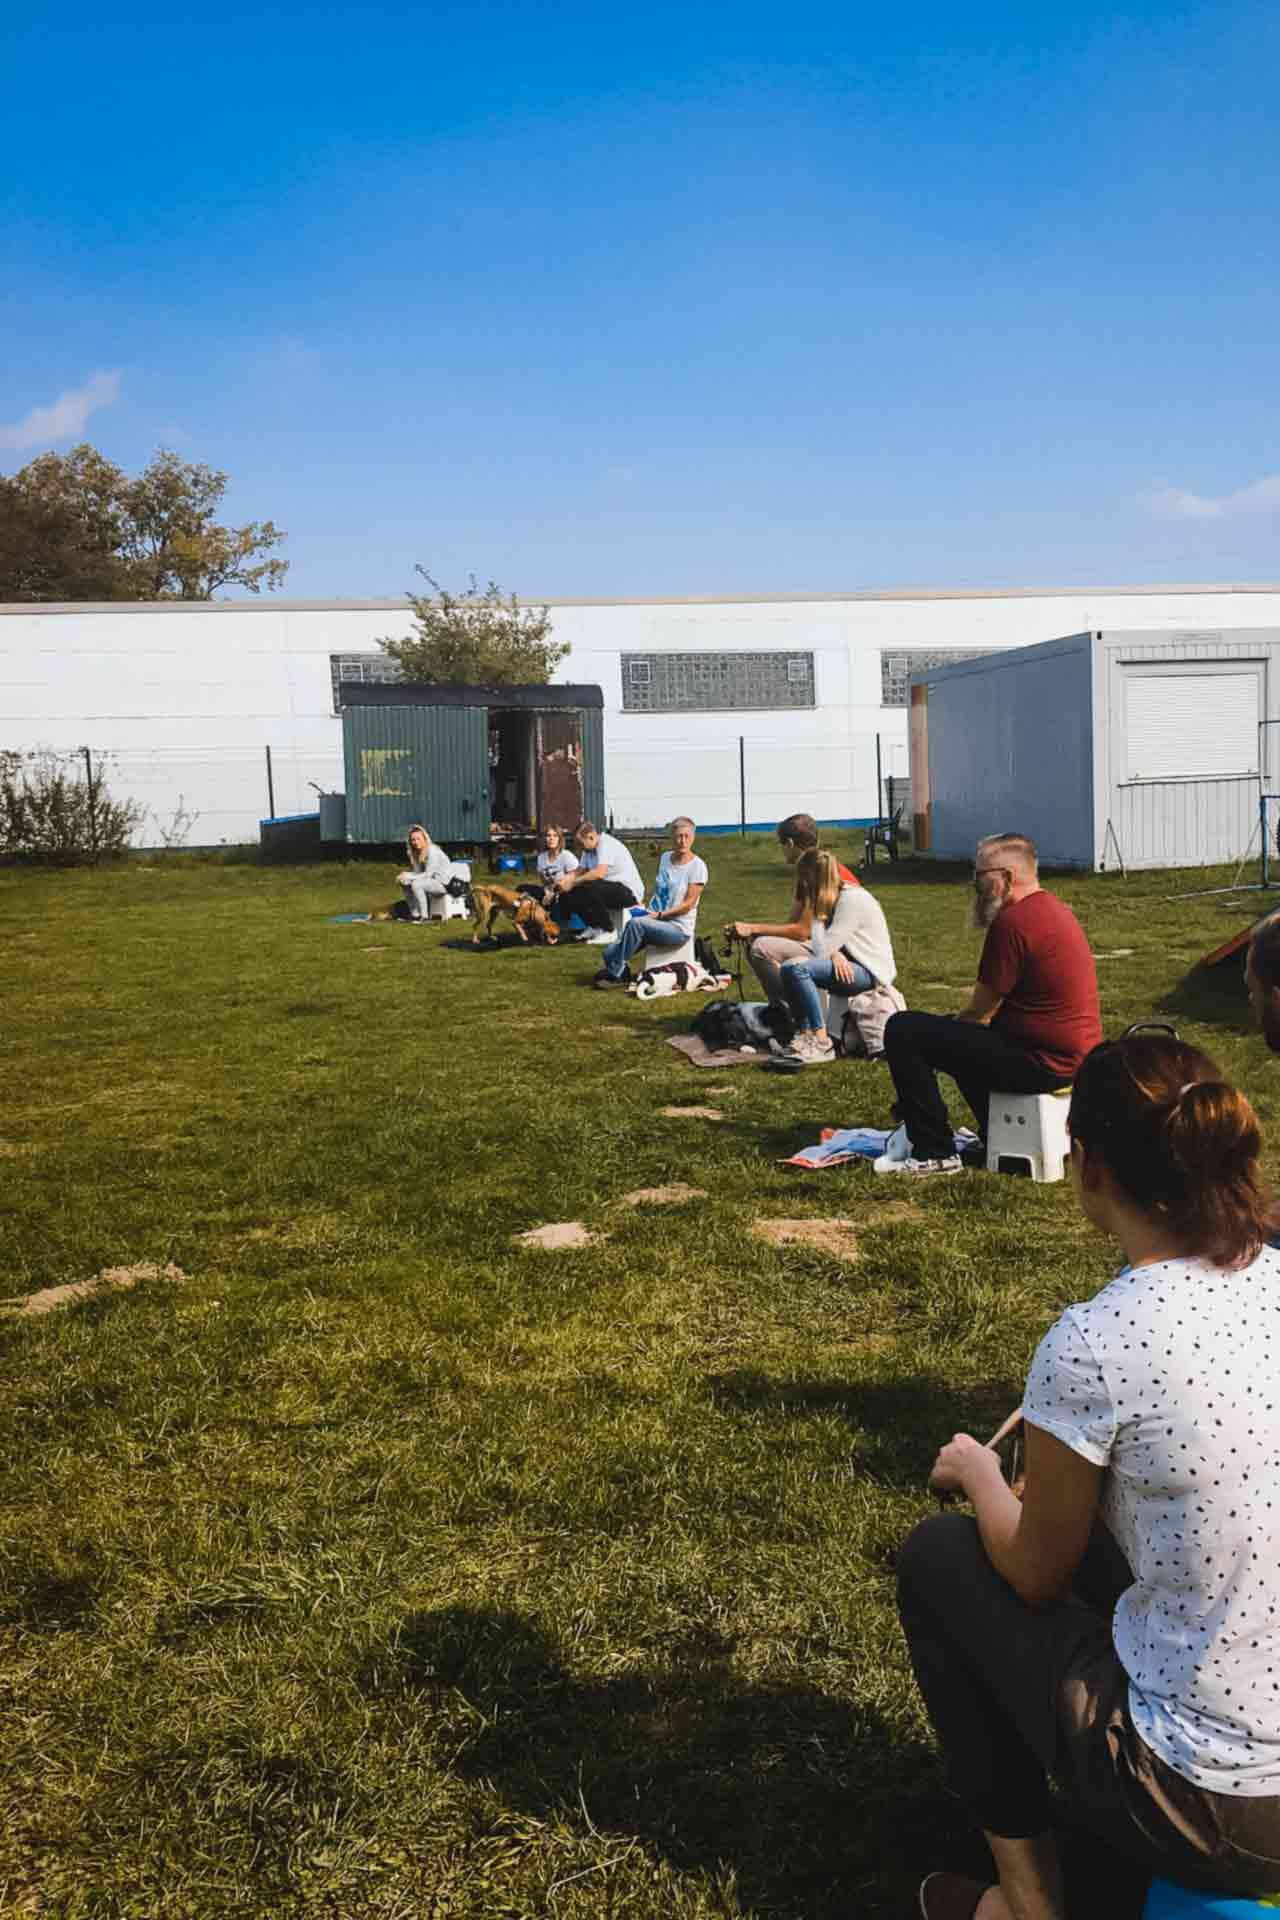 hundpunkt_hundeschule_muenster-ibbenbueren-kurse-gruppentraining-5